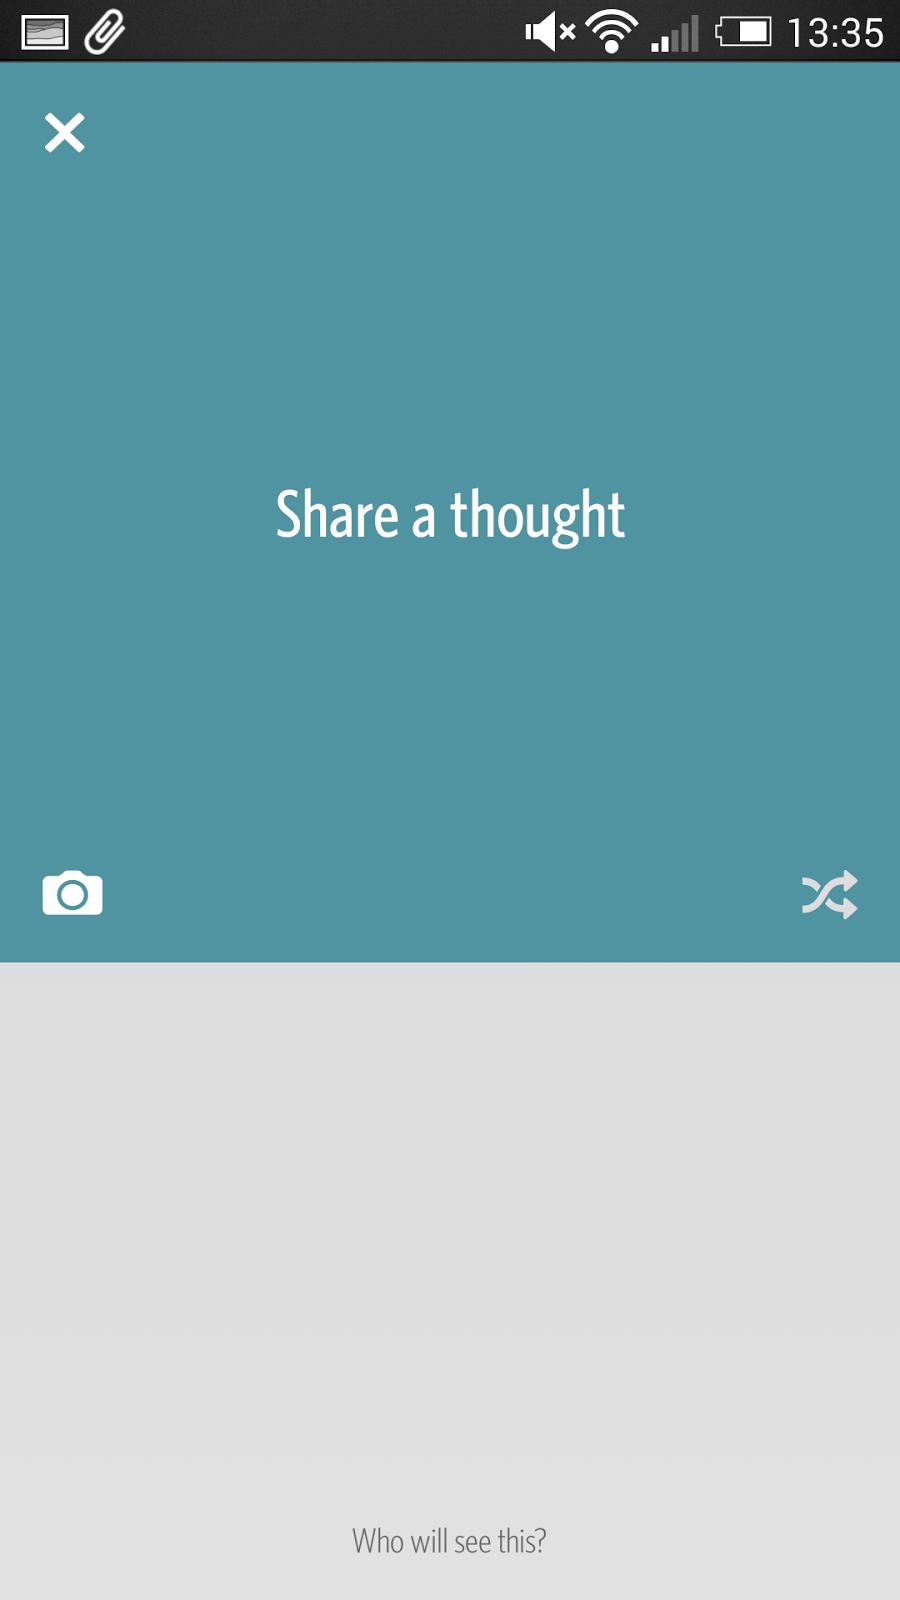 Secret 解除分享焦慮的社交 App ,對朋友匿名寫真心話 secret-09